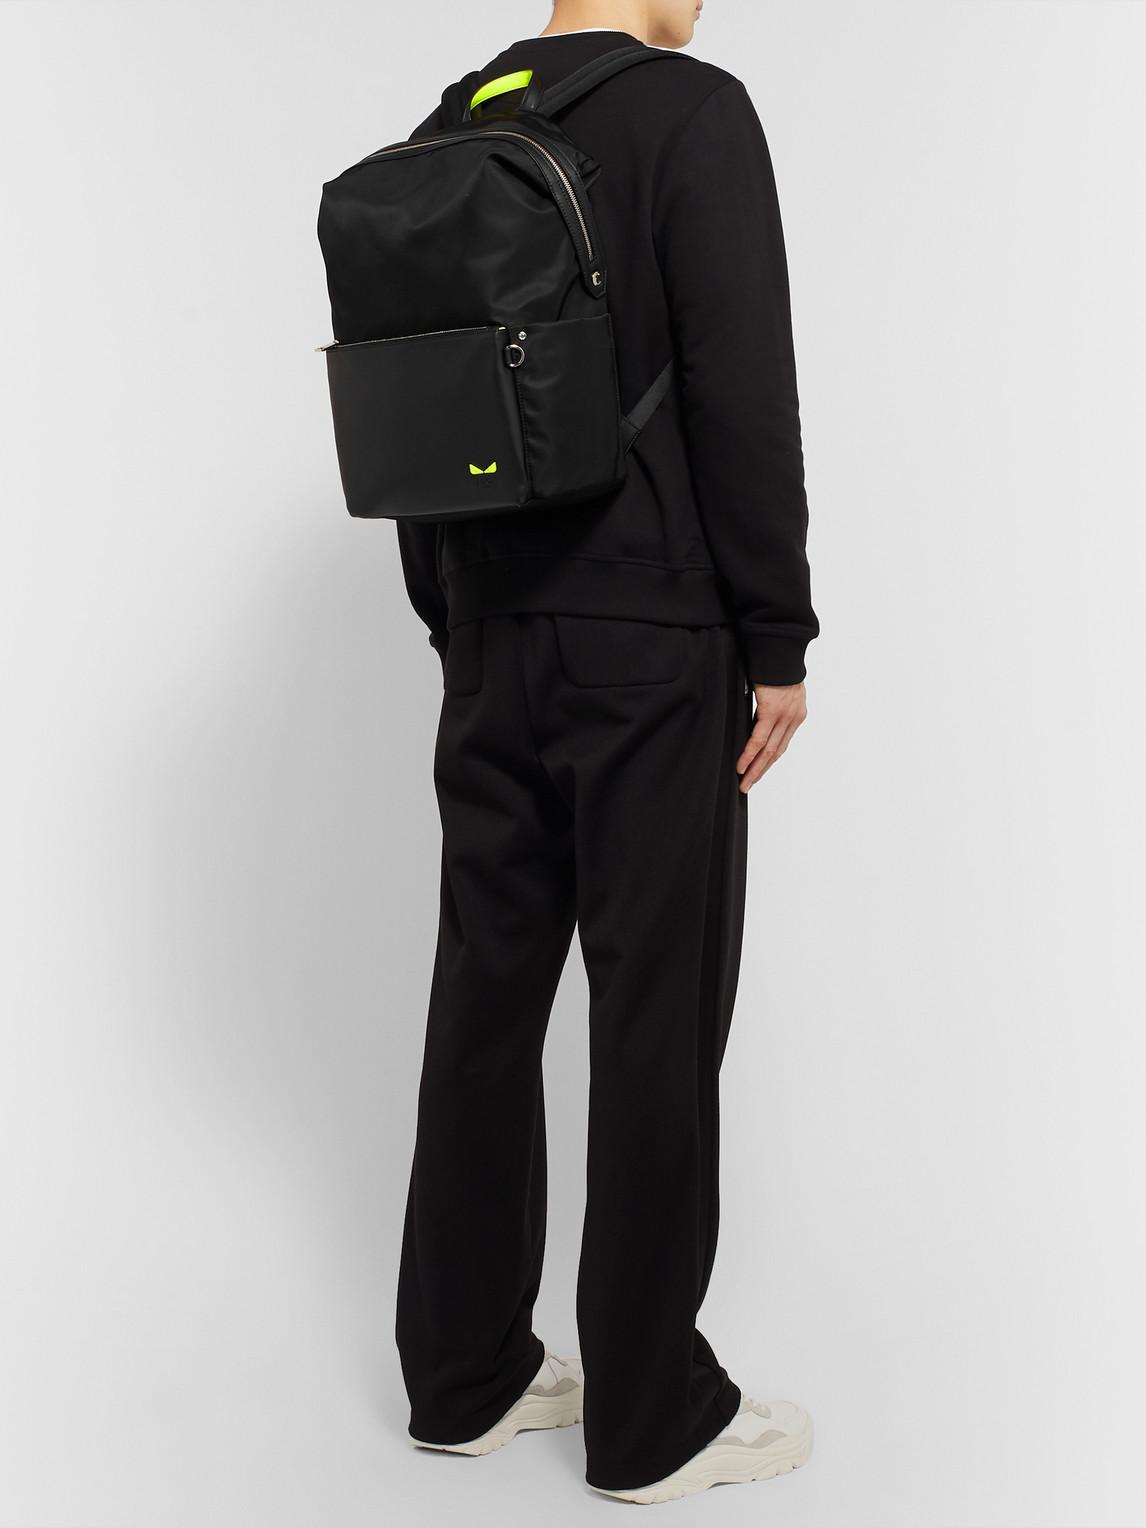 Fendi Backpacks BAG BUGS NYLON AND LEATHER BACKPACK